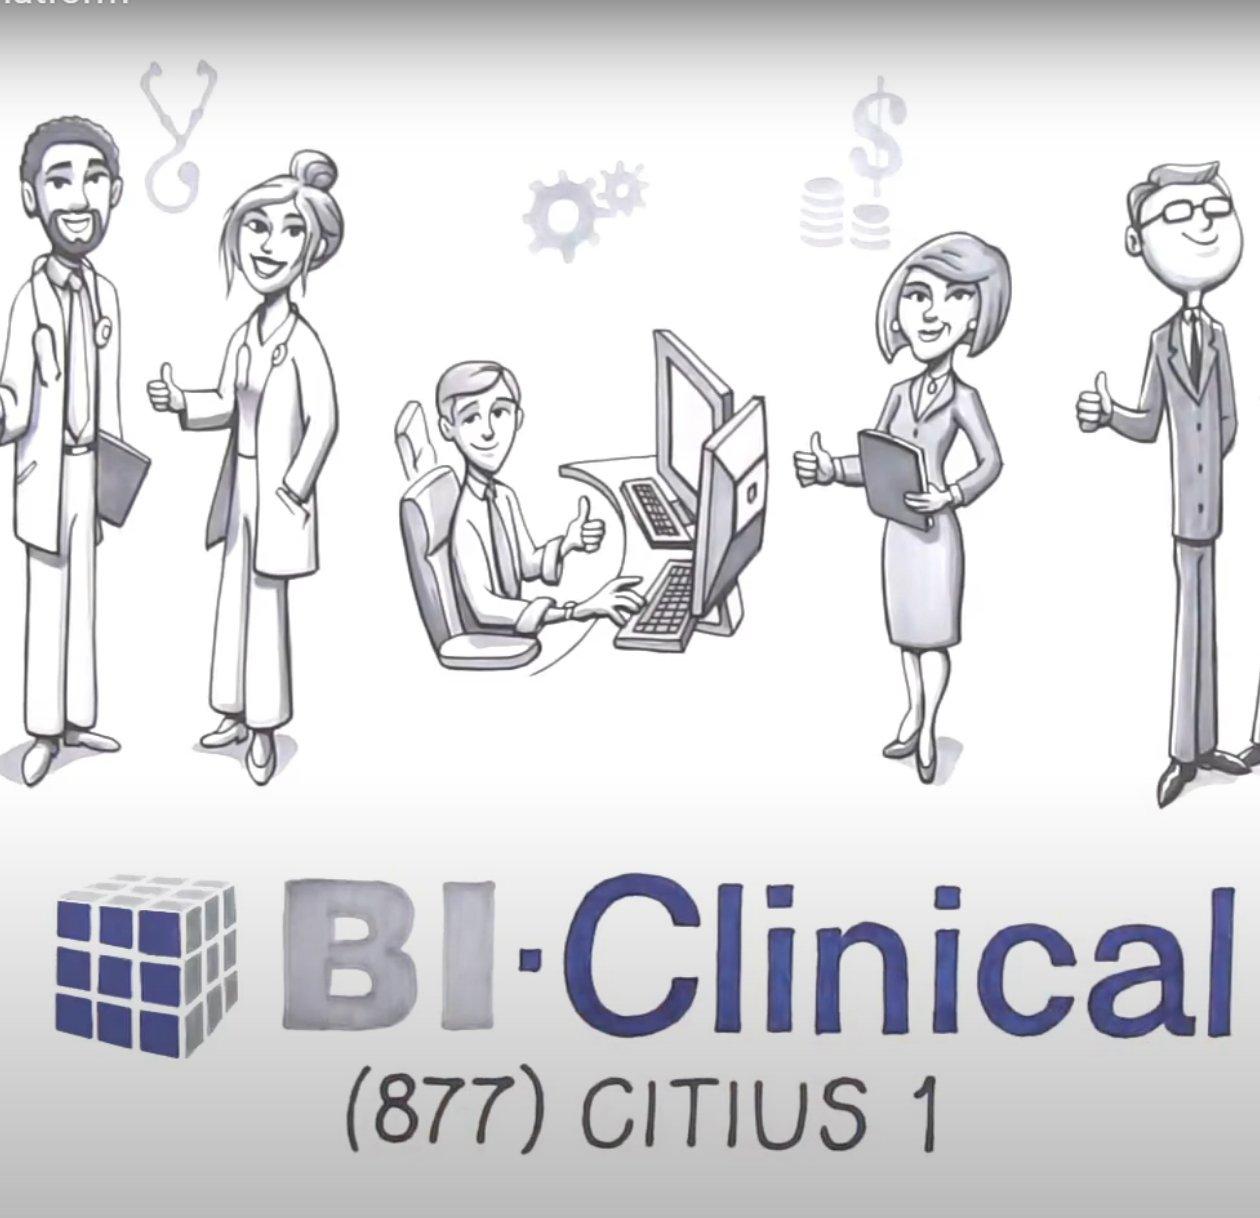 CitiusTech Platform: BI-Clinical